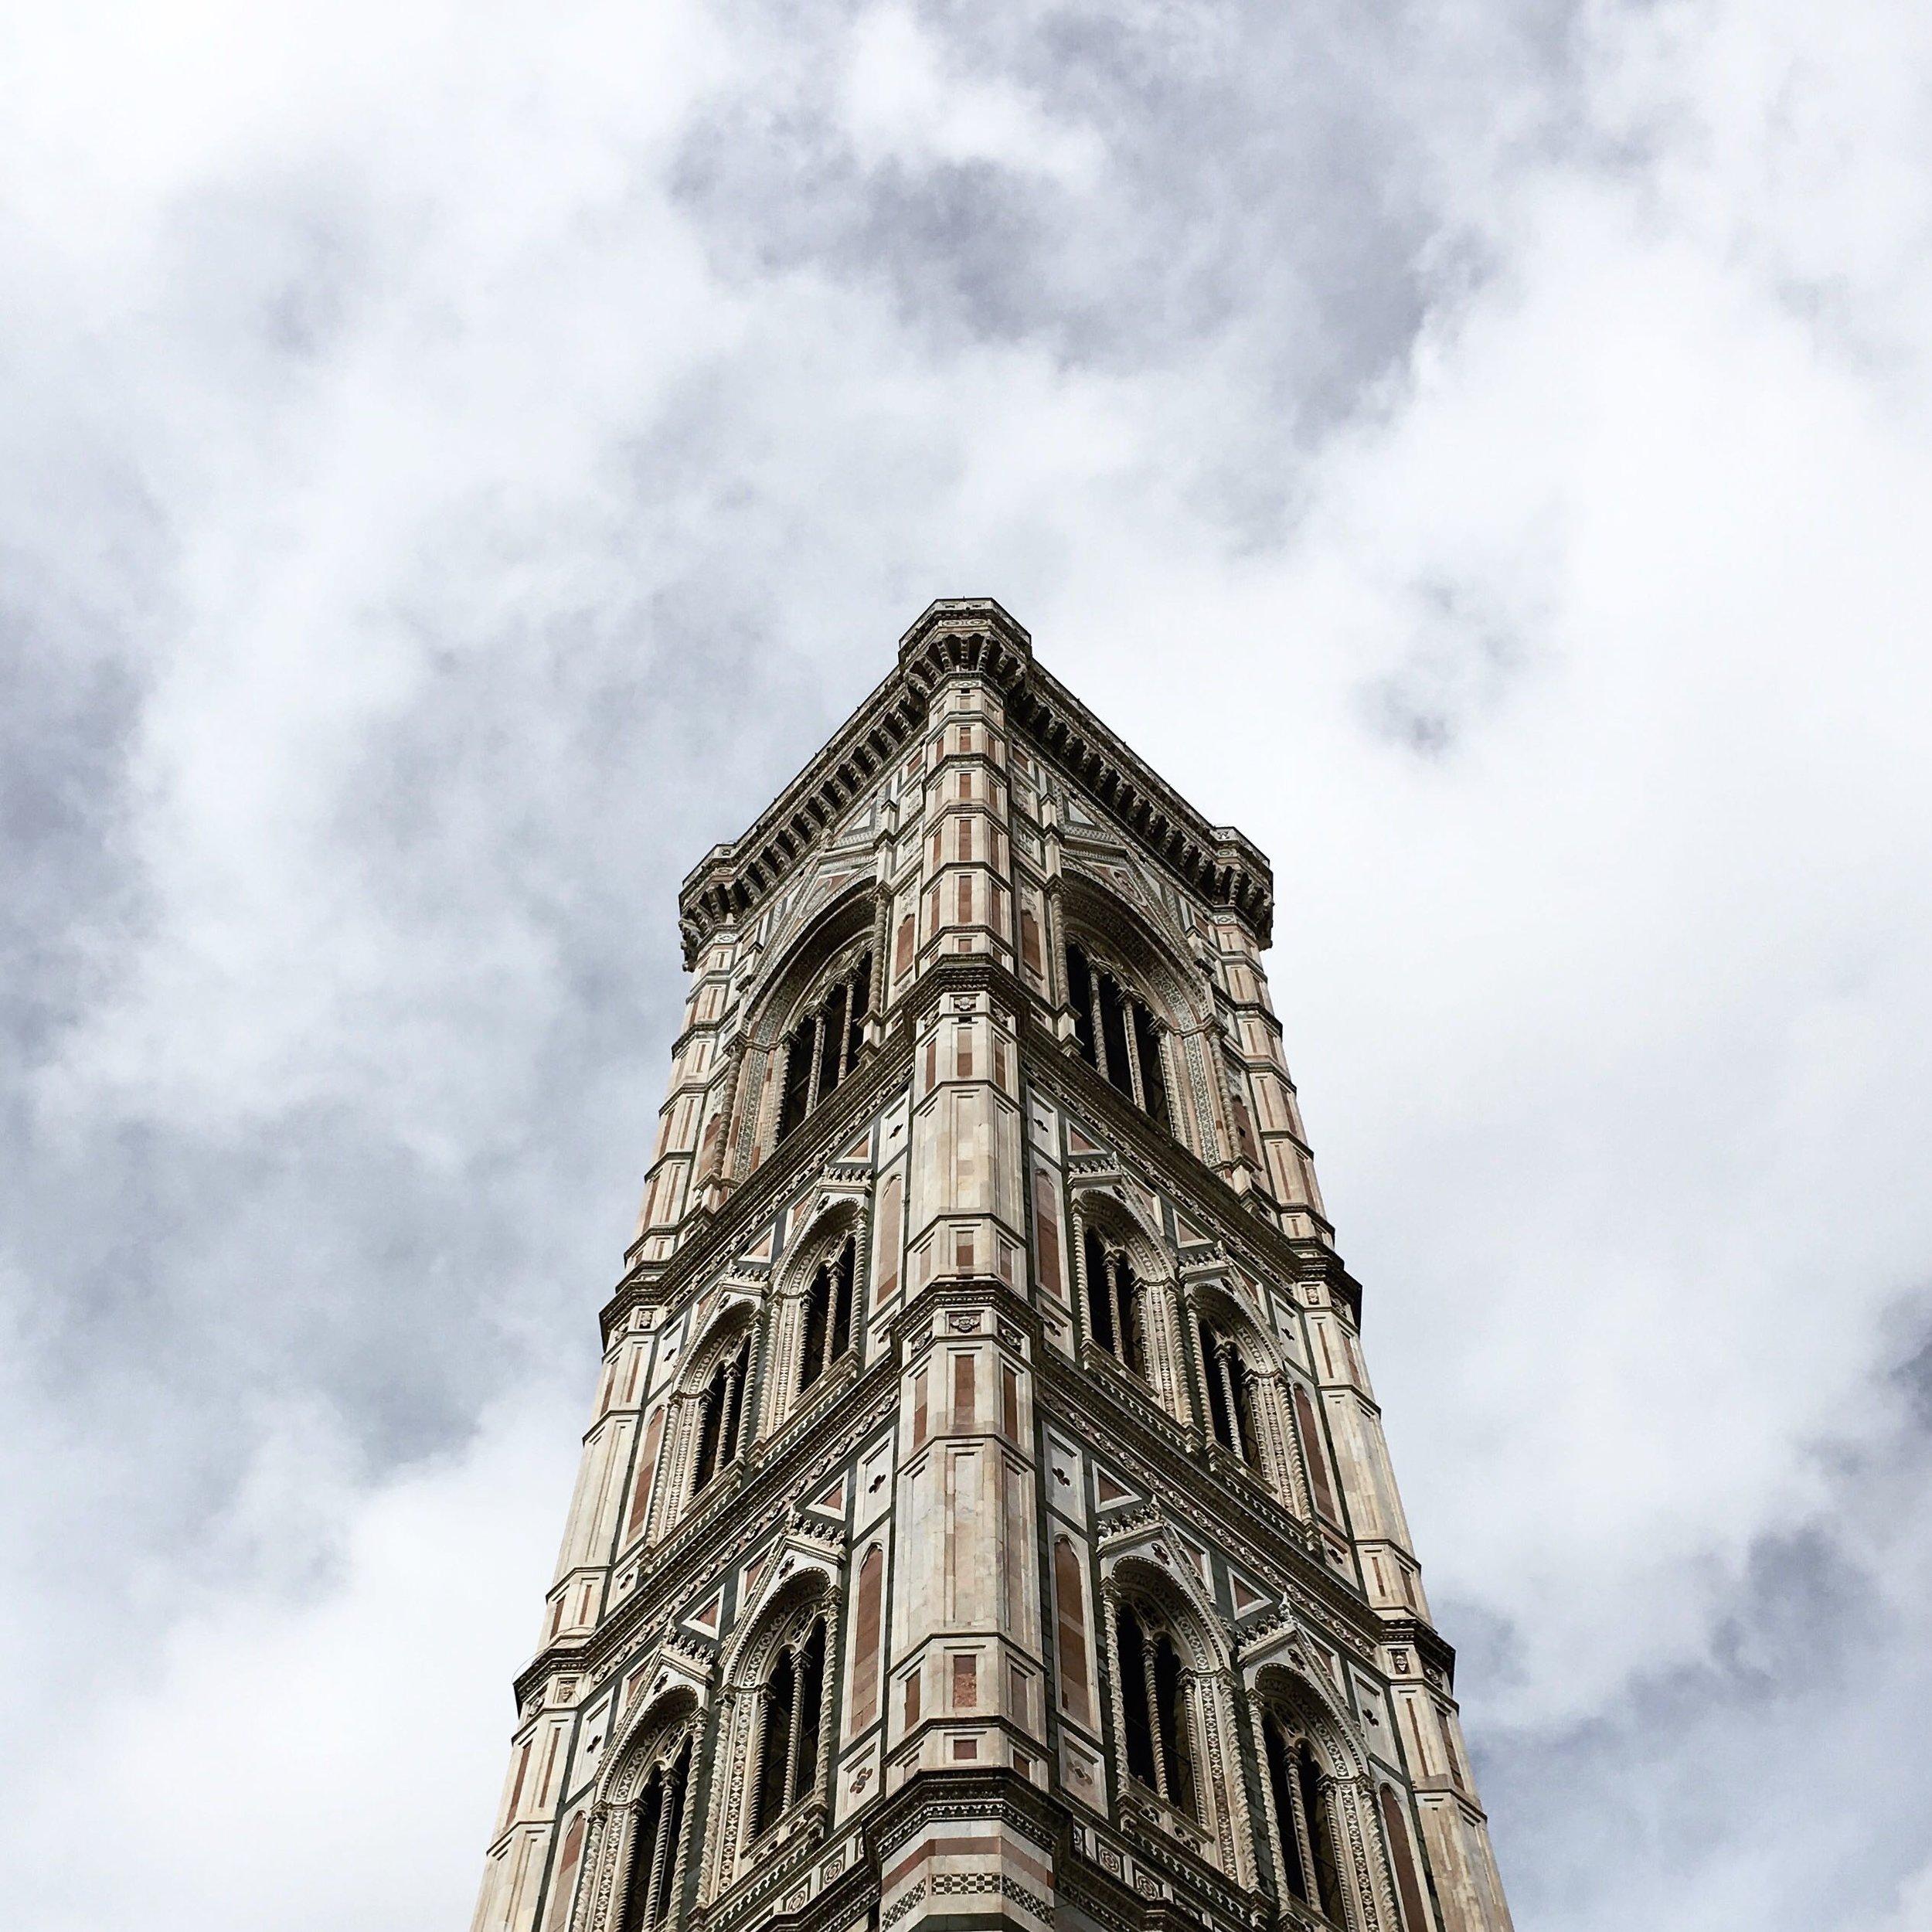 Lozidaze_Duomo_03